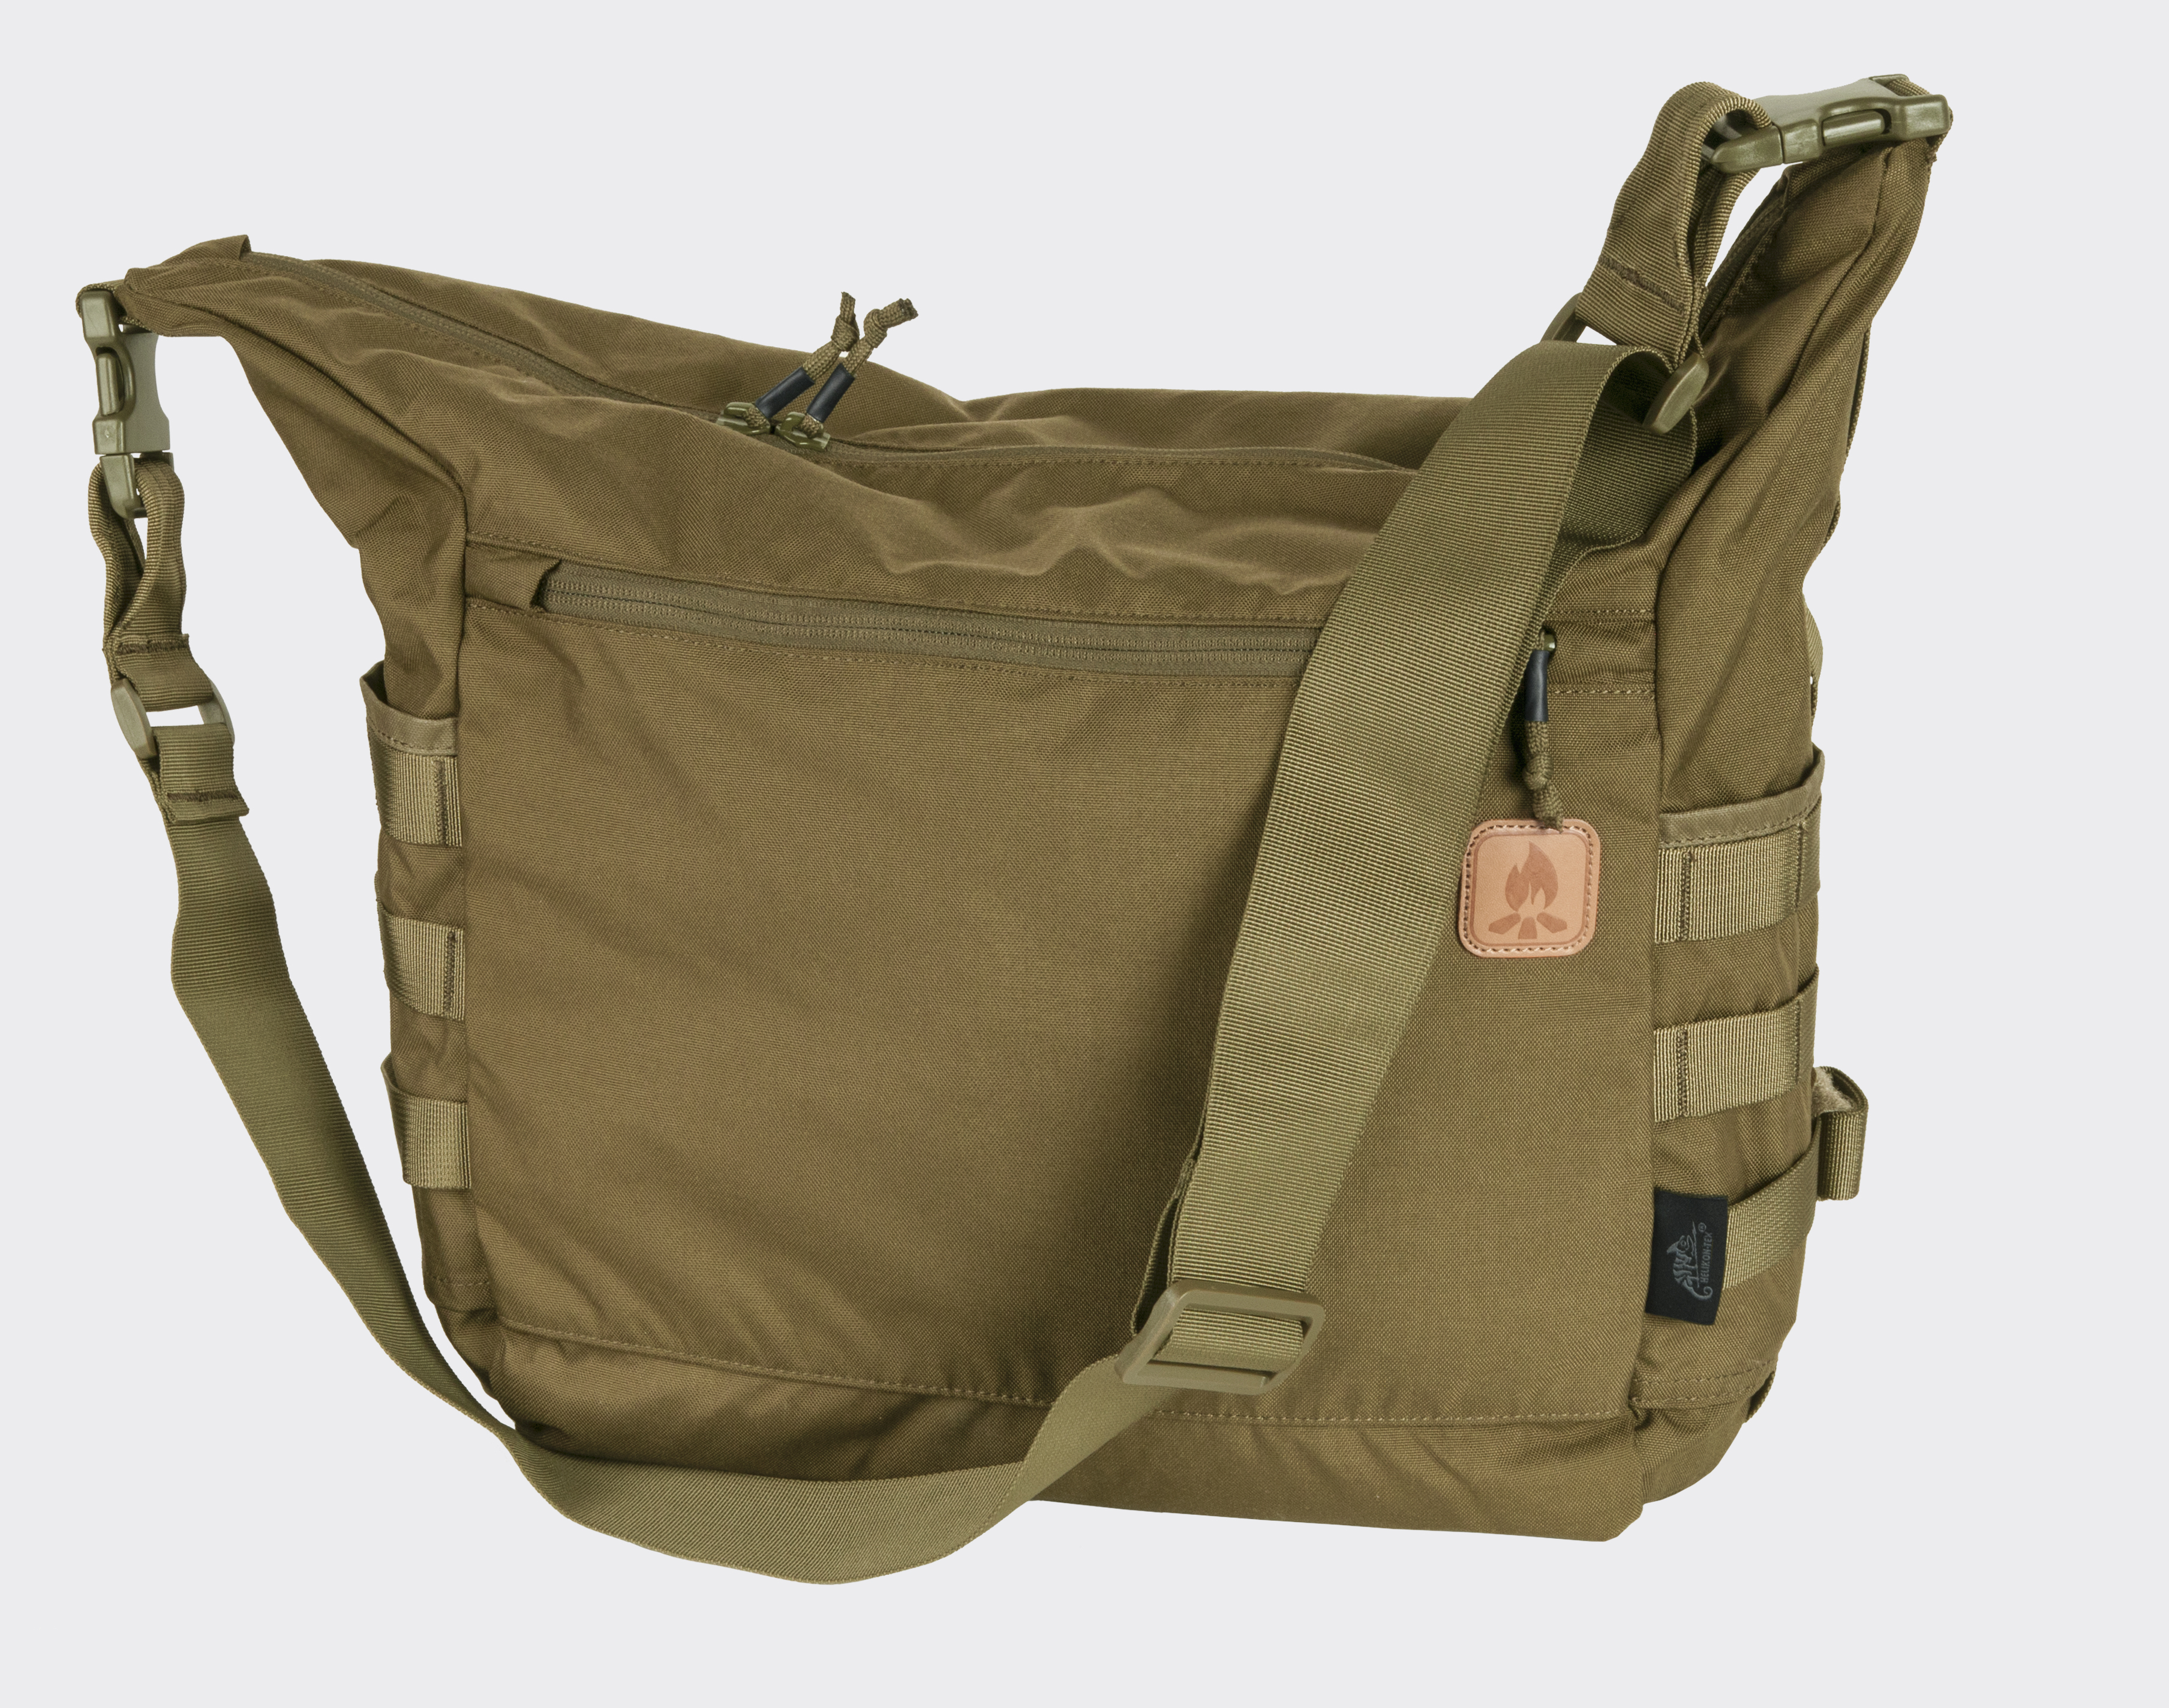 Helikon BUSHCRAFT SATCHEL Bag Cordura Umhängetasche Outdoor Tasche Coyote.